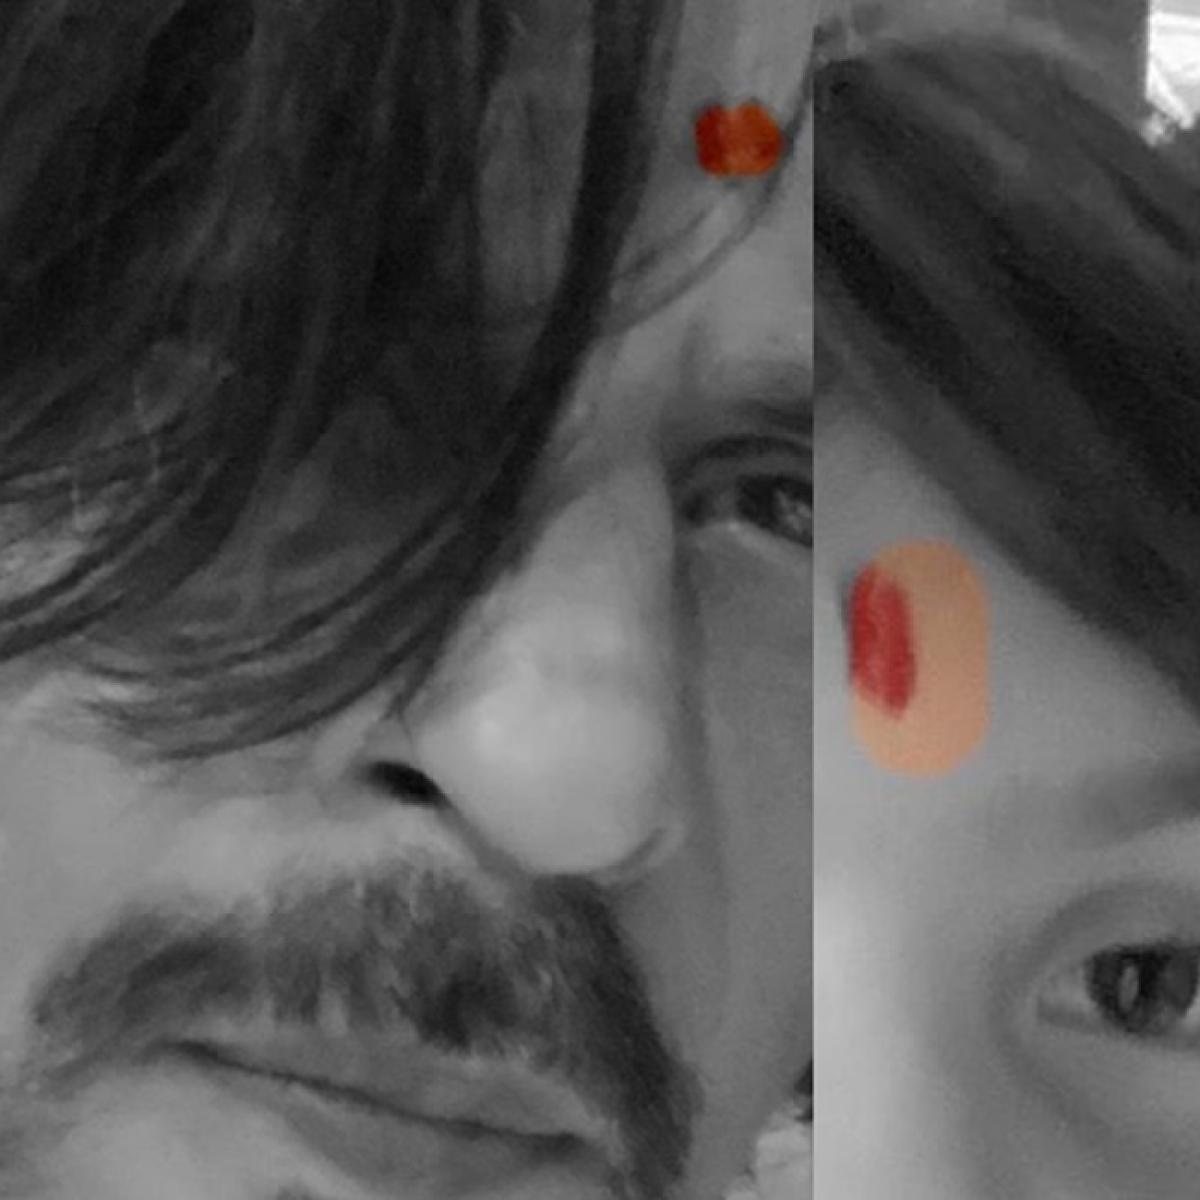 Shah Rukh Khan trolled for 'photoshopped tilak' in Ganesh Chaturthi selfie